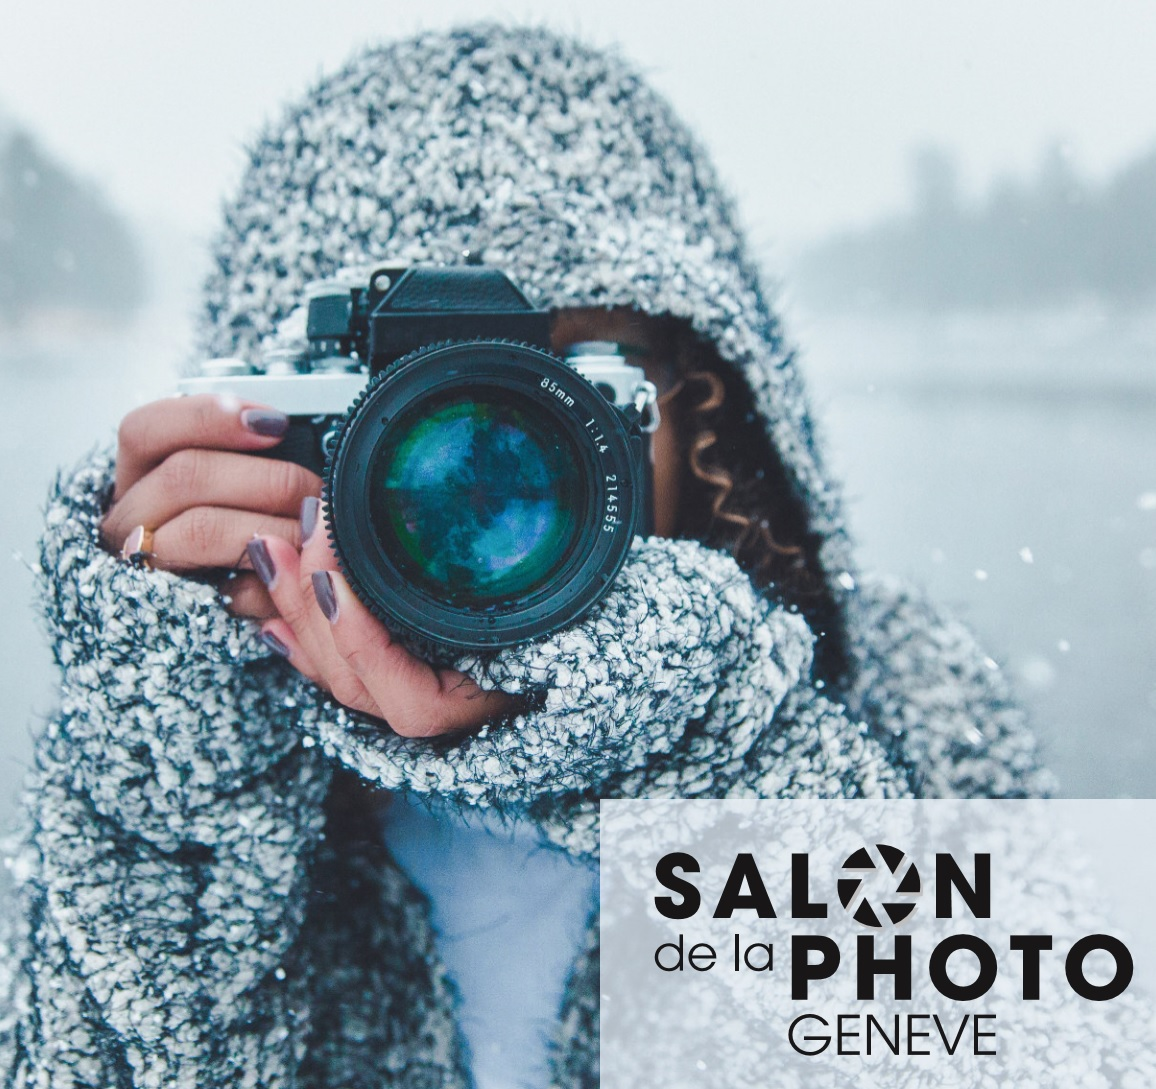 Salon de la Photo Genève: Noch bis Samstagabend - fotointern.ch – Tagesaktuelle Fotonews